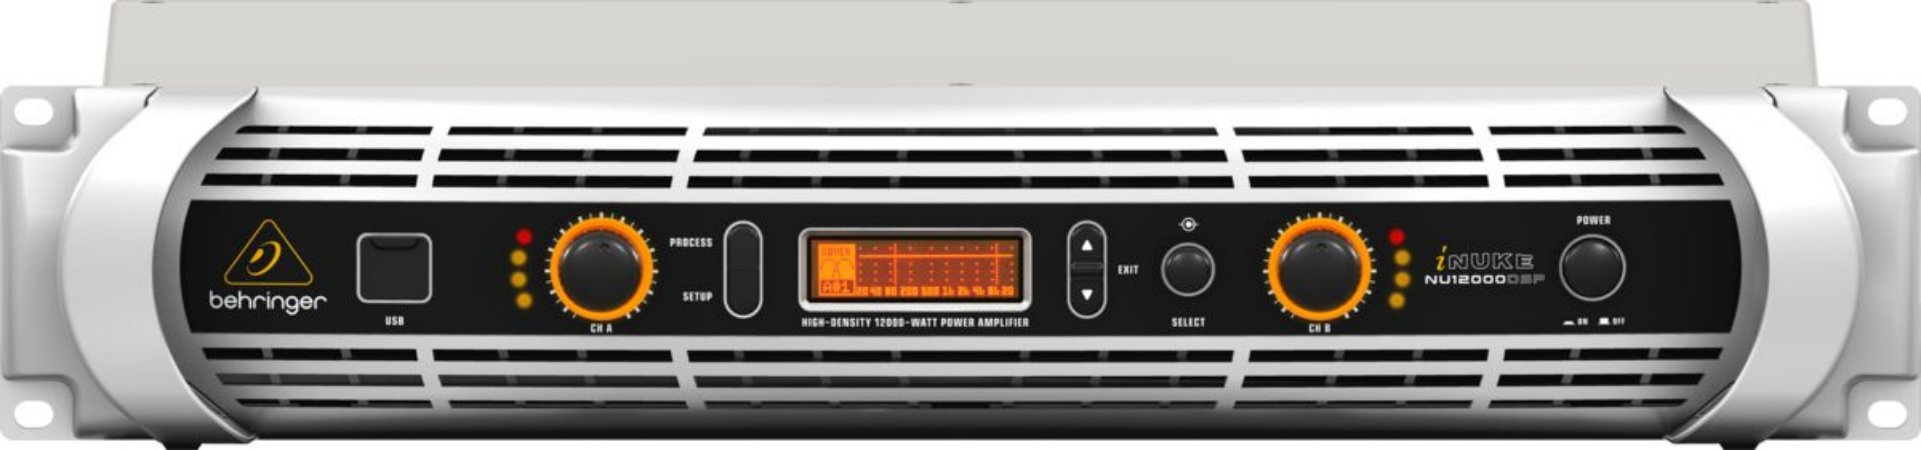 Amplificador de Potência Behringer  Inuke NU12000 DSP 220V